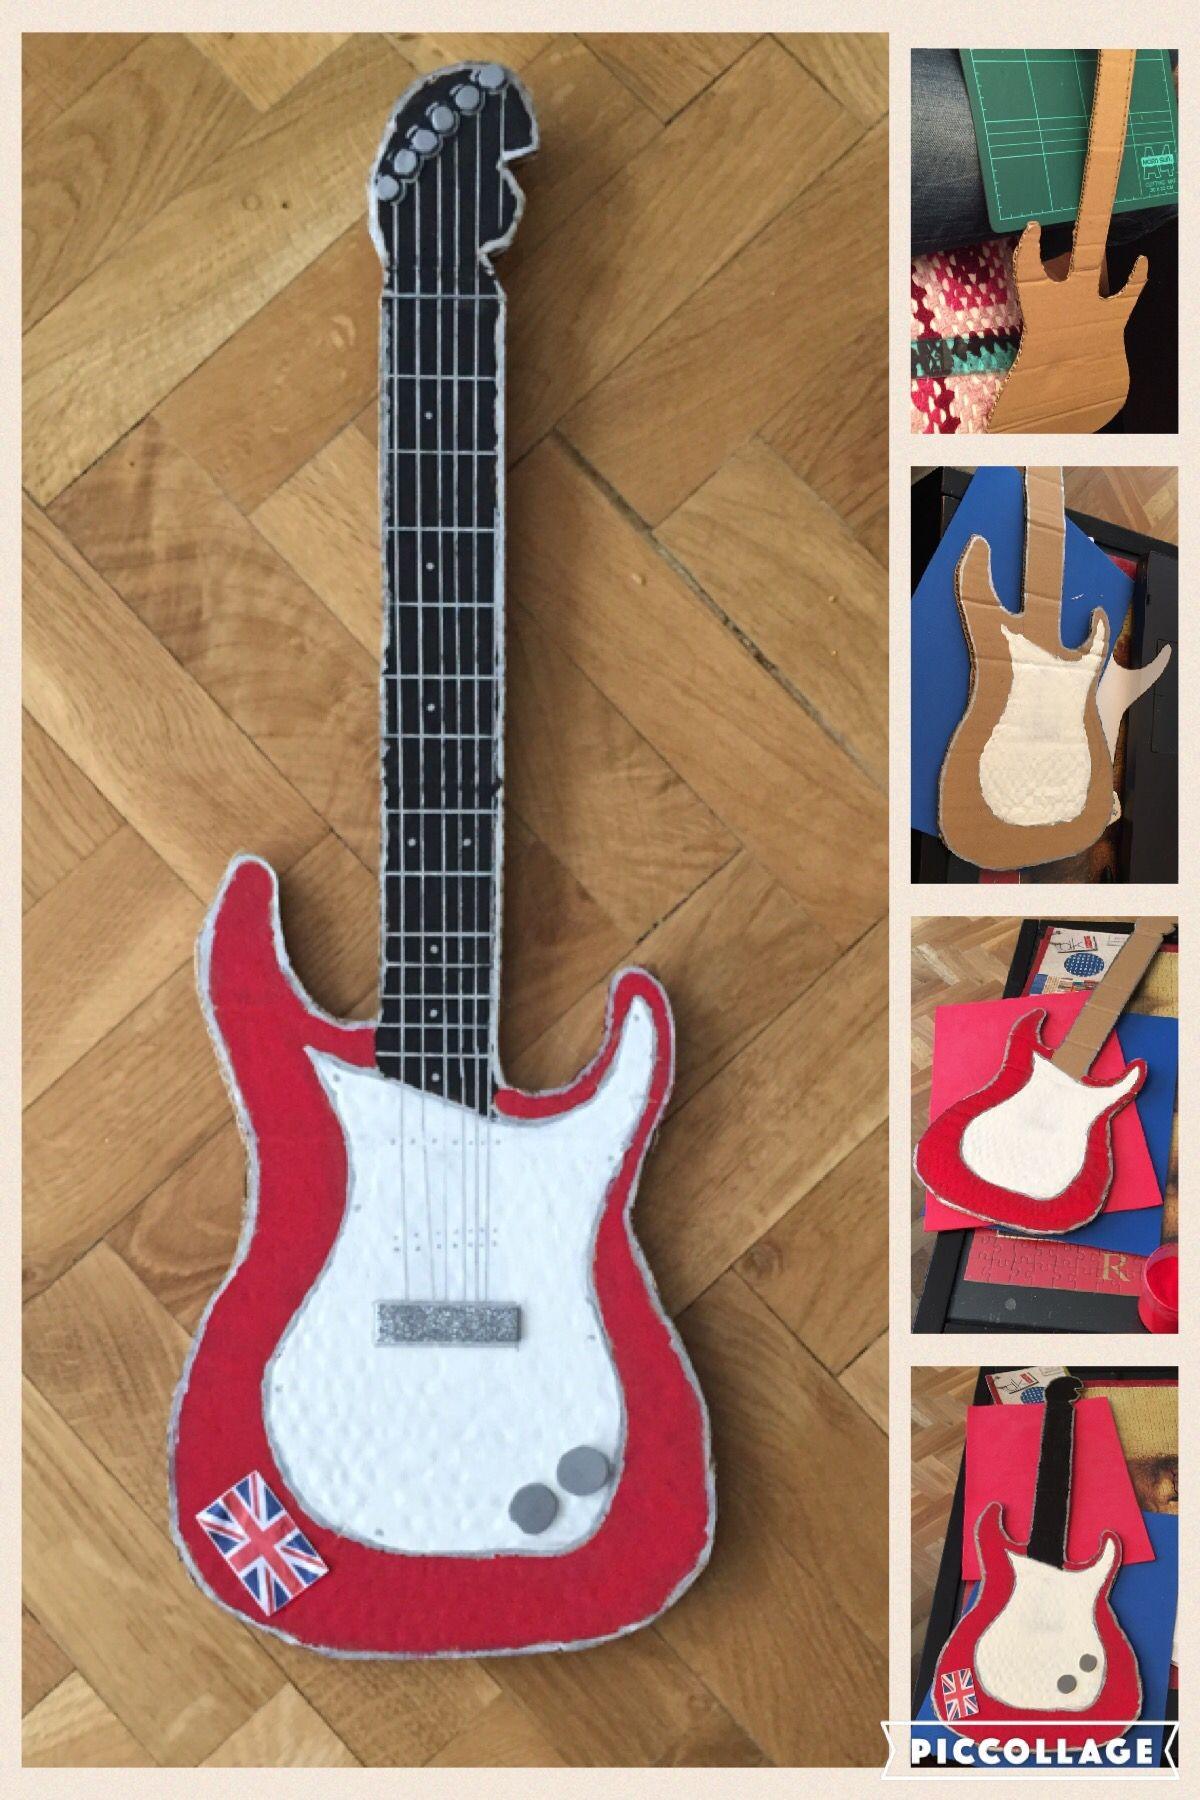 Papercraft Guitar Rockstars Guitar Guitarra Realizada Con Cart³n Para Carnavales